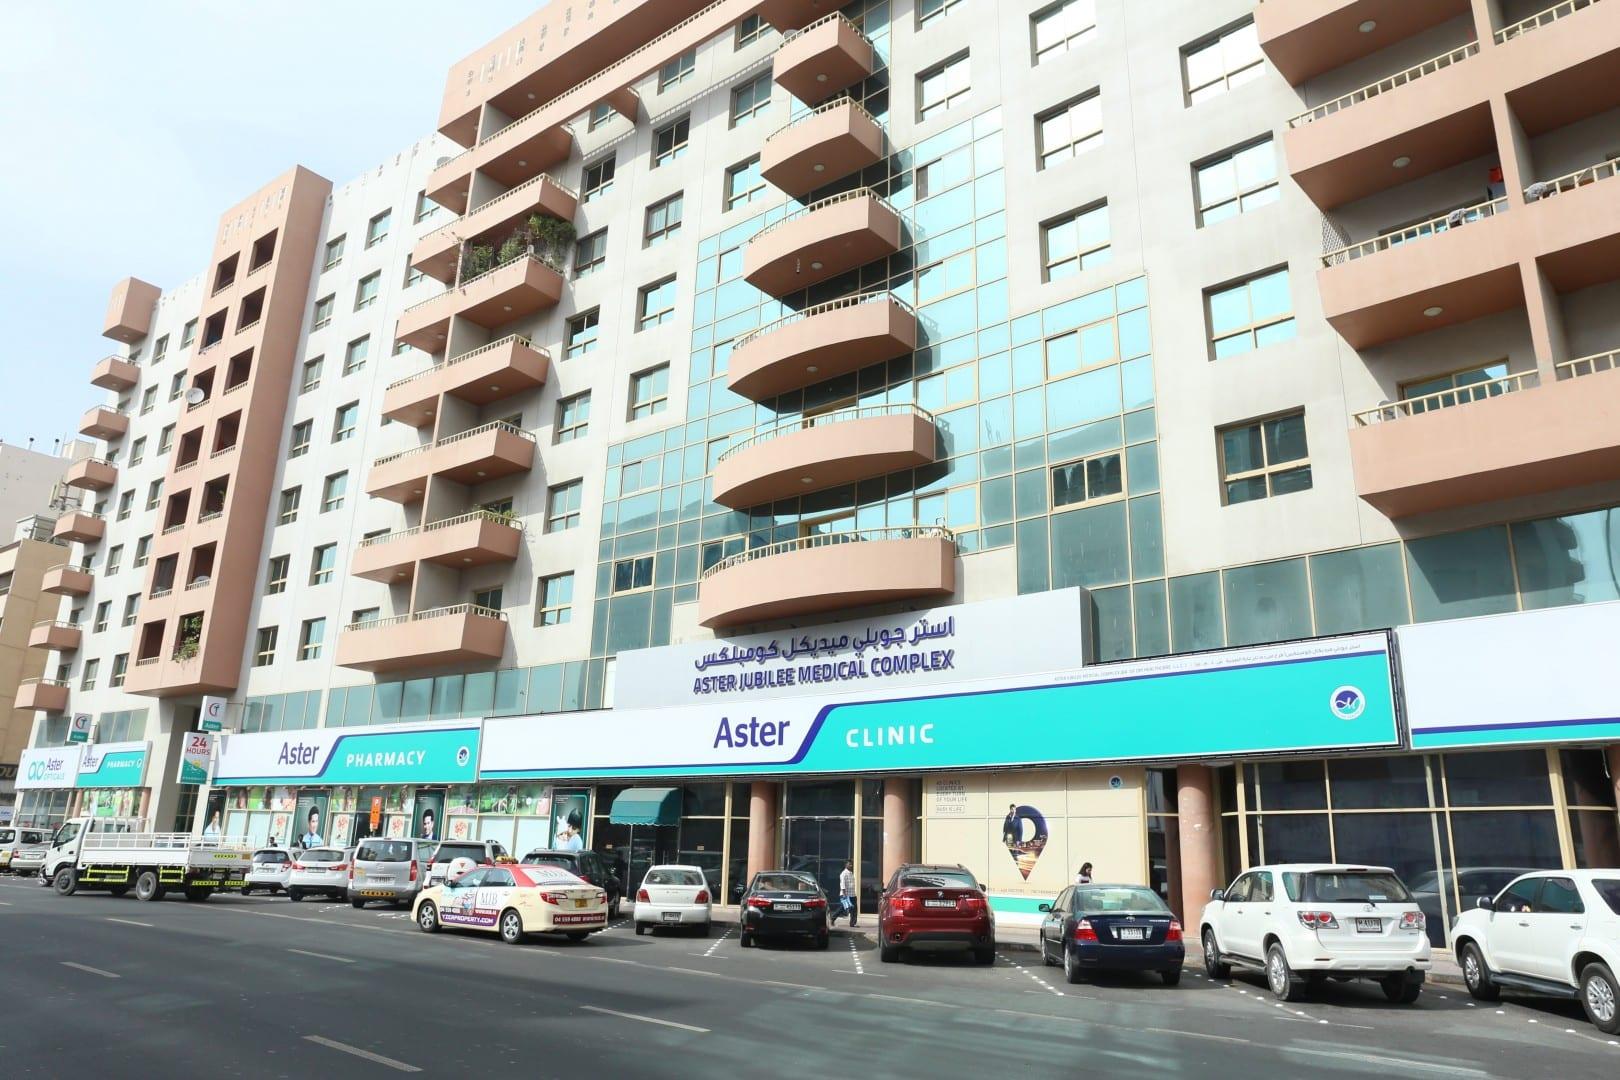 Aster Clinic, Bur Dubai (AJMC, Bank St.)